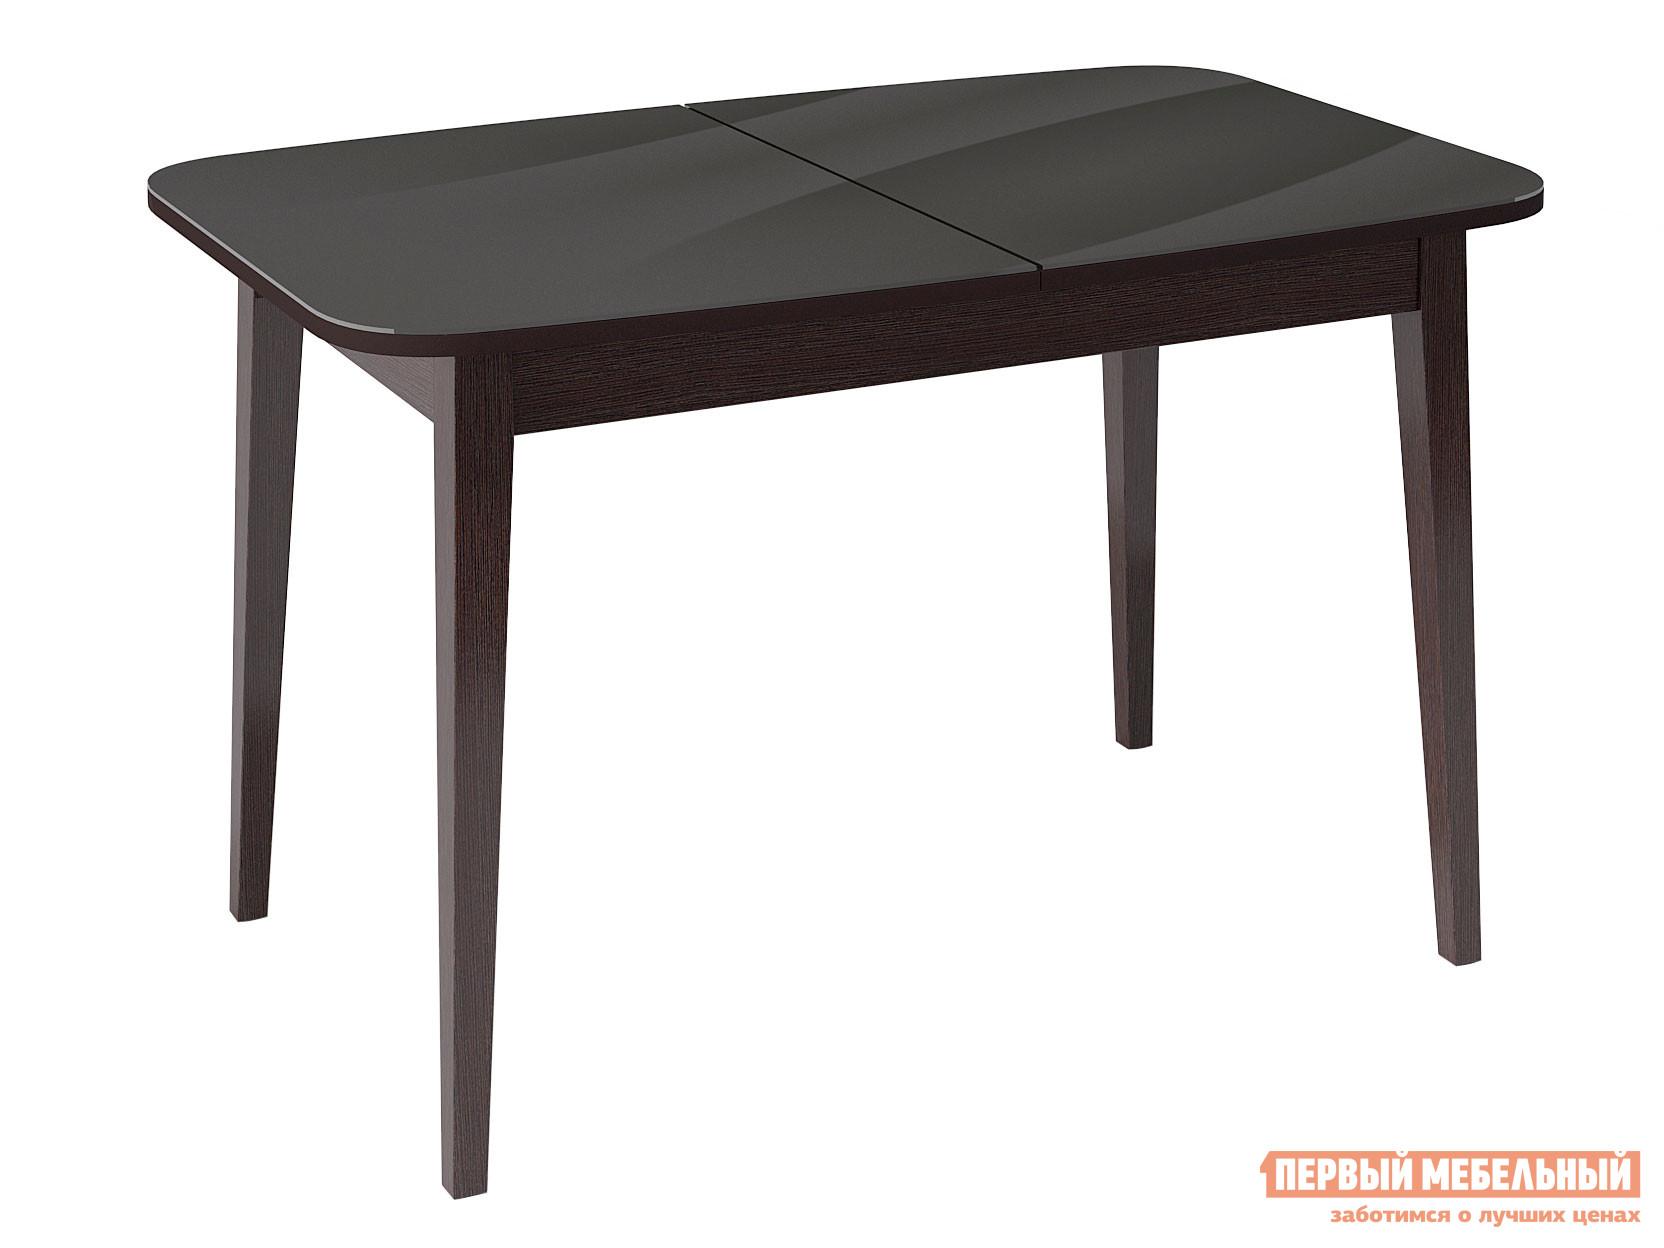 Кухонный стол ДИК KENNER 1200М